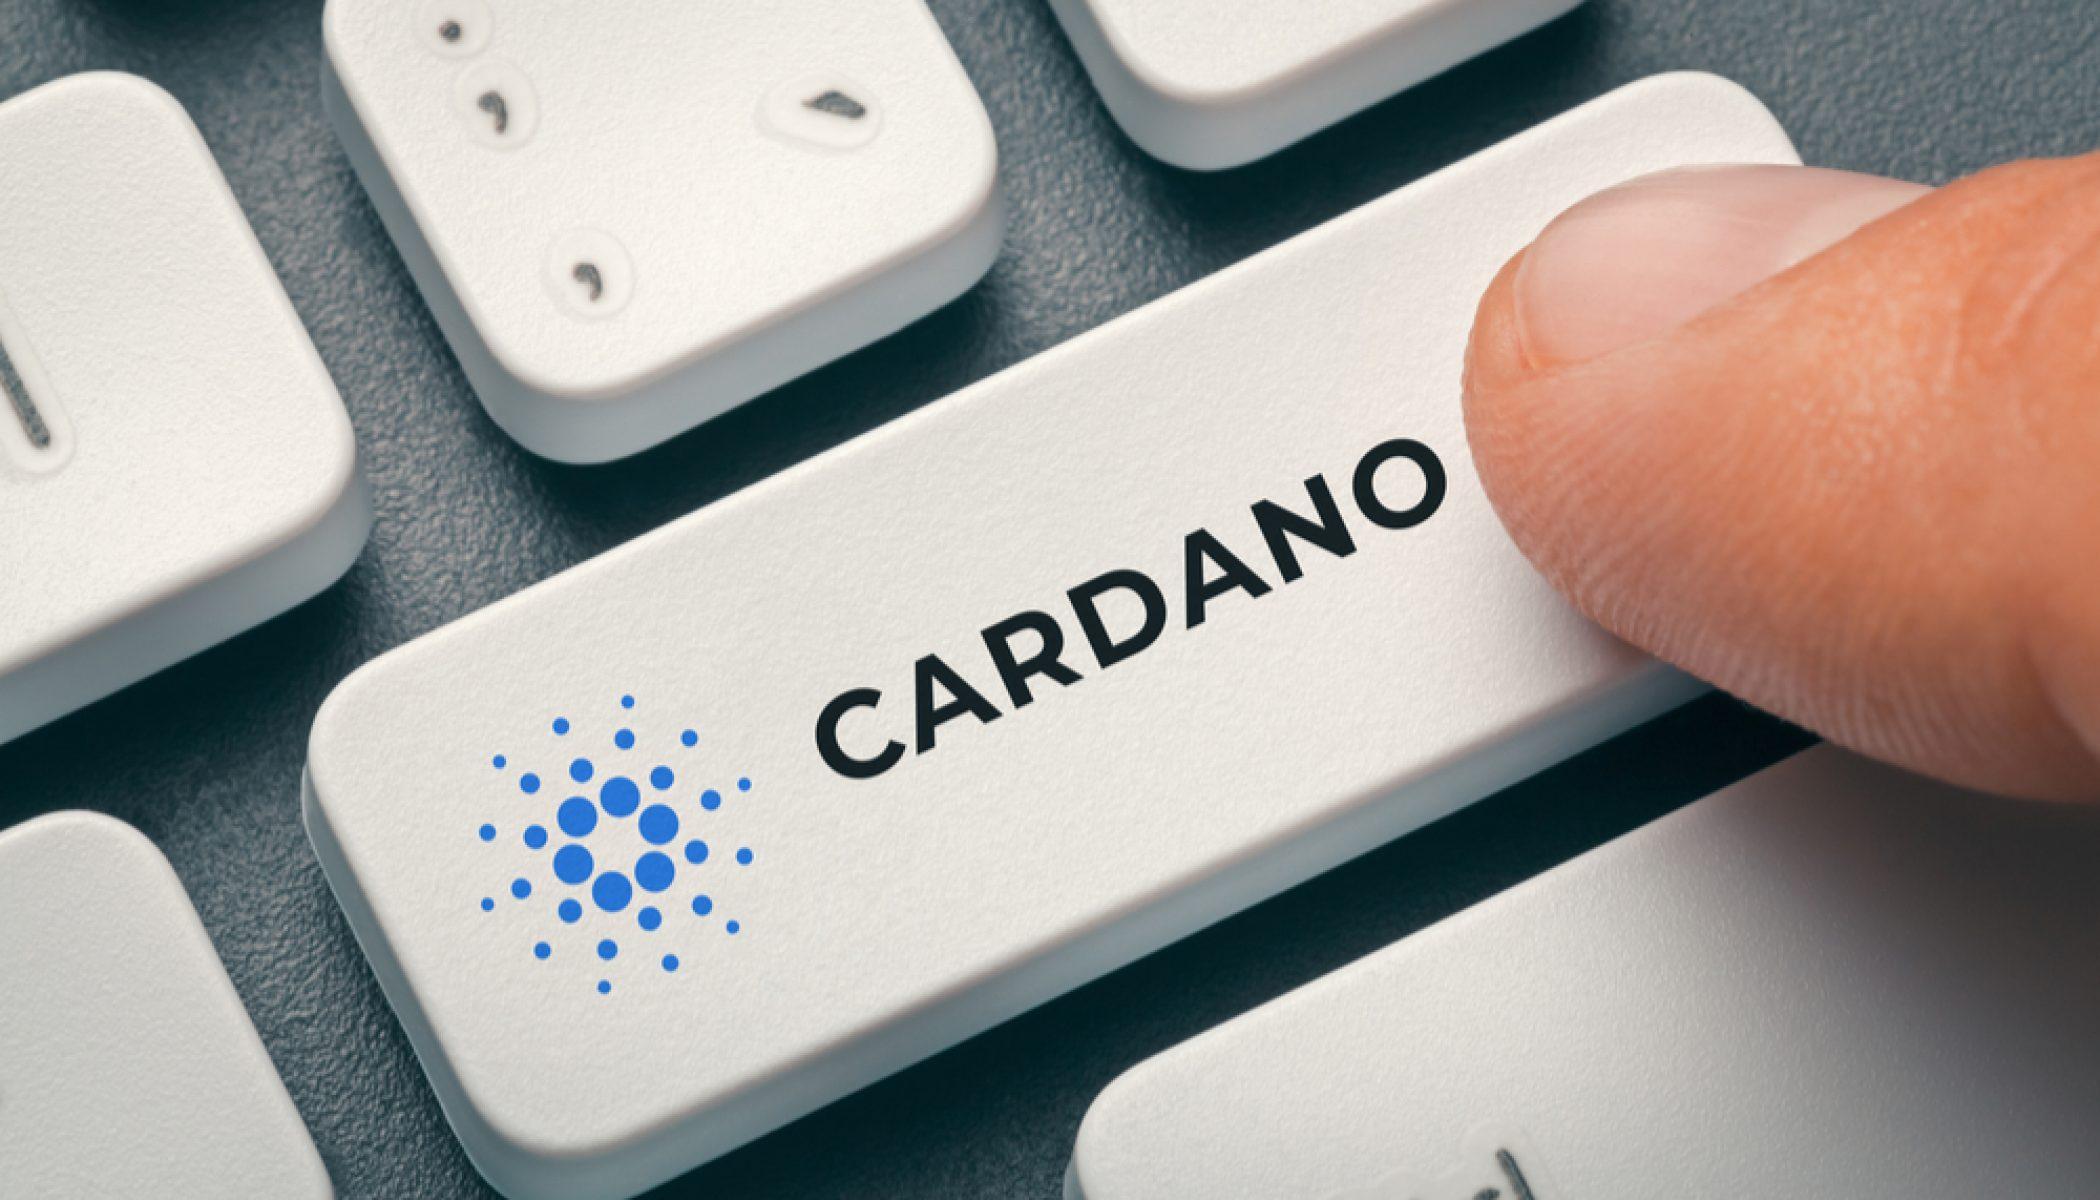 cardano 2100x1200 1